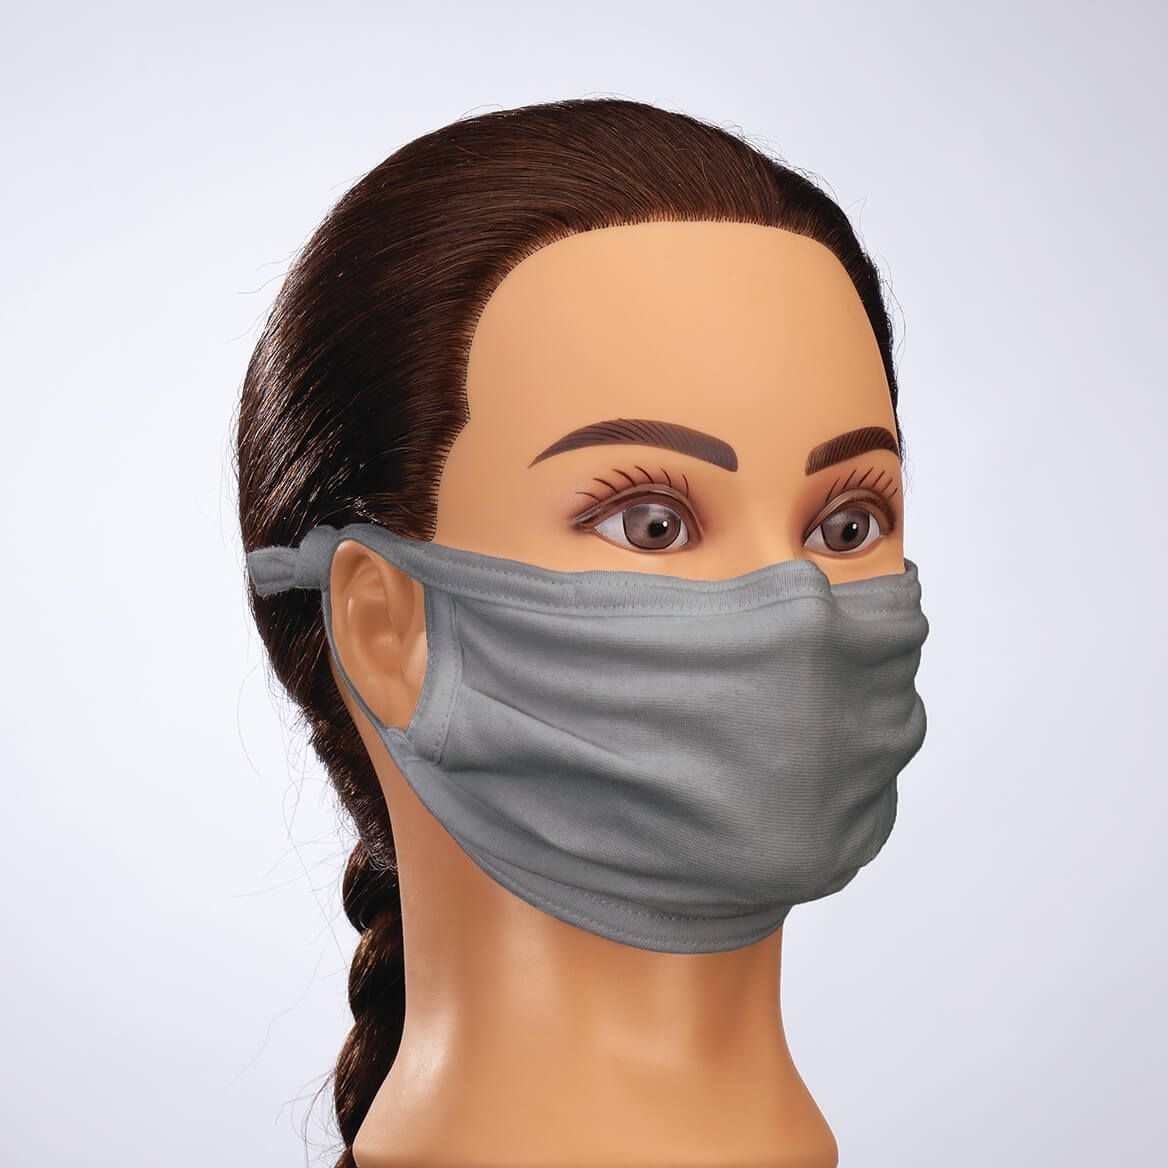 Breathable Cotton Reusable Masks, Set of 5-371645